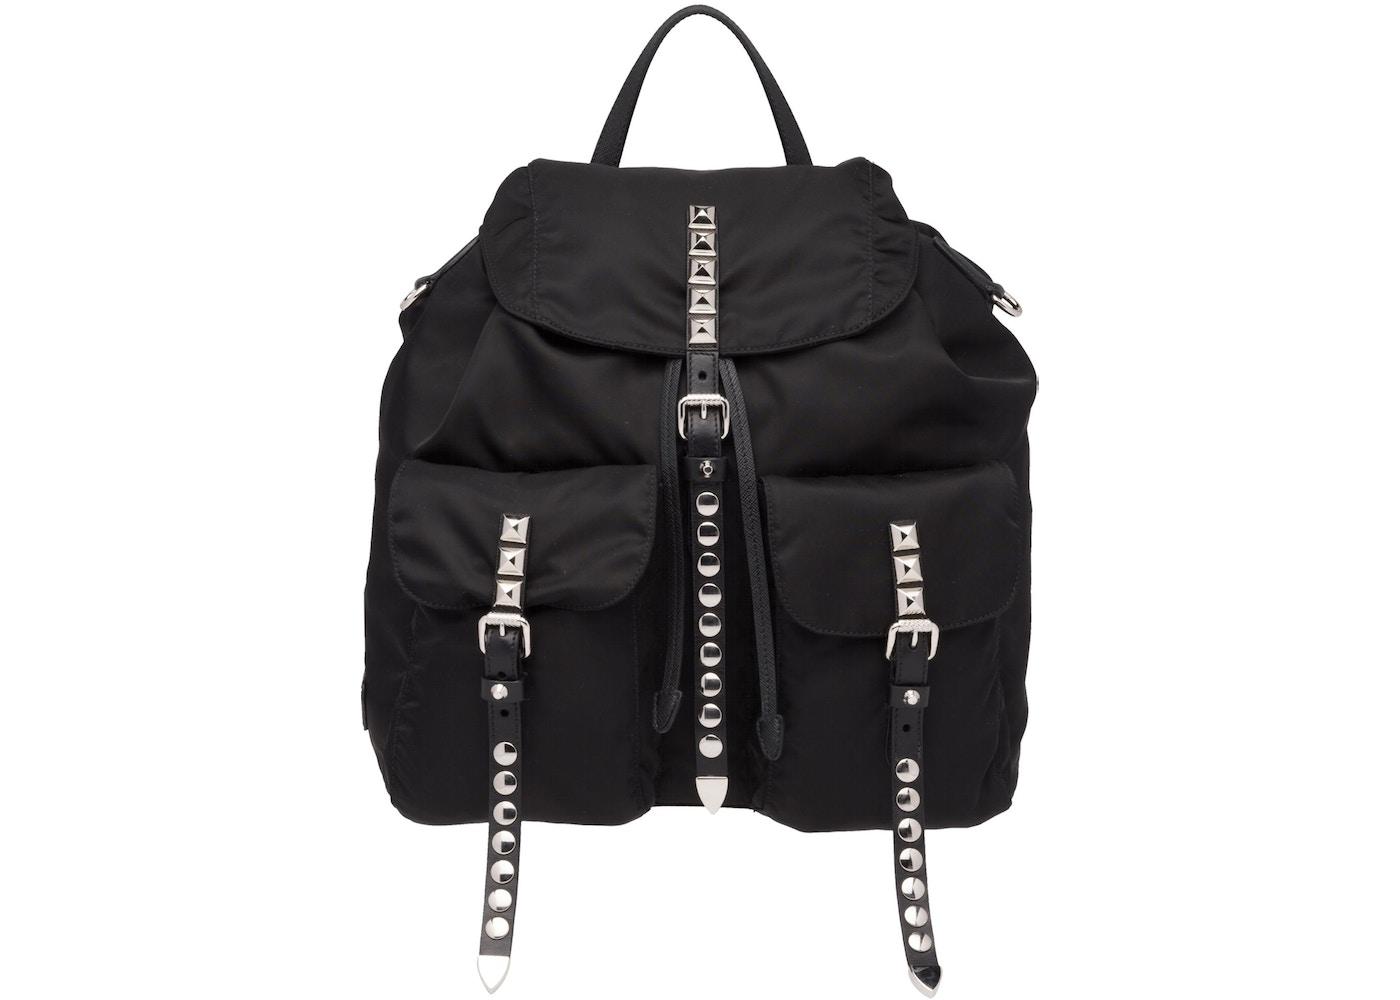 fea9e289dfd Prada Vela Backpack Silver-Studded Black Saffiano Leather Black